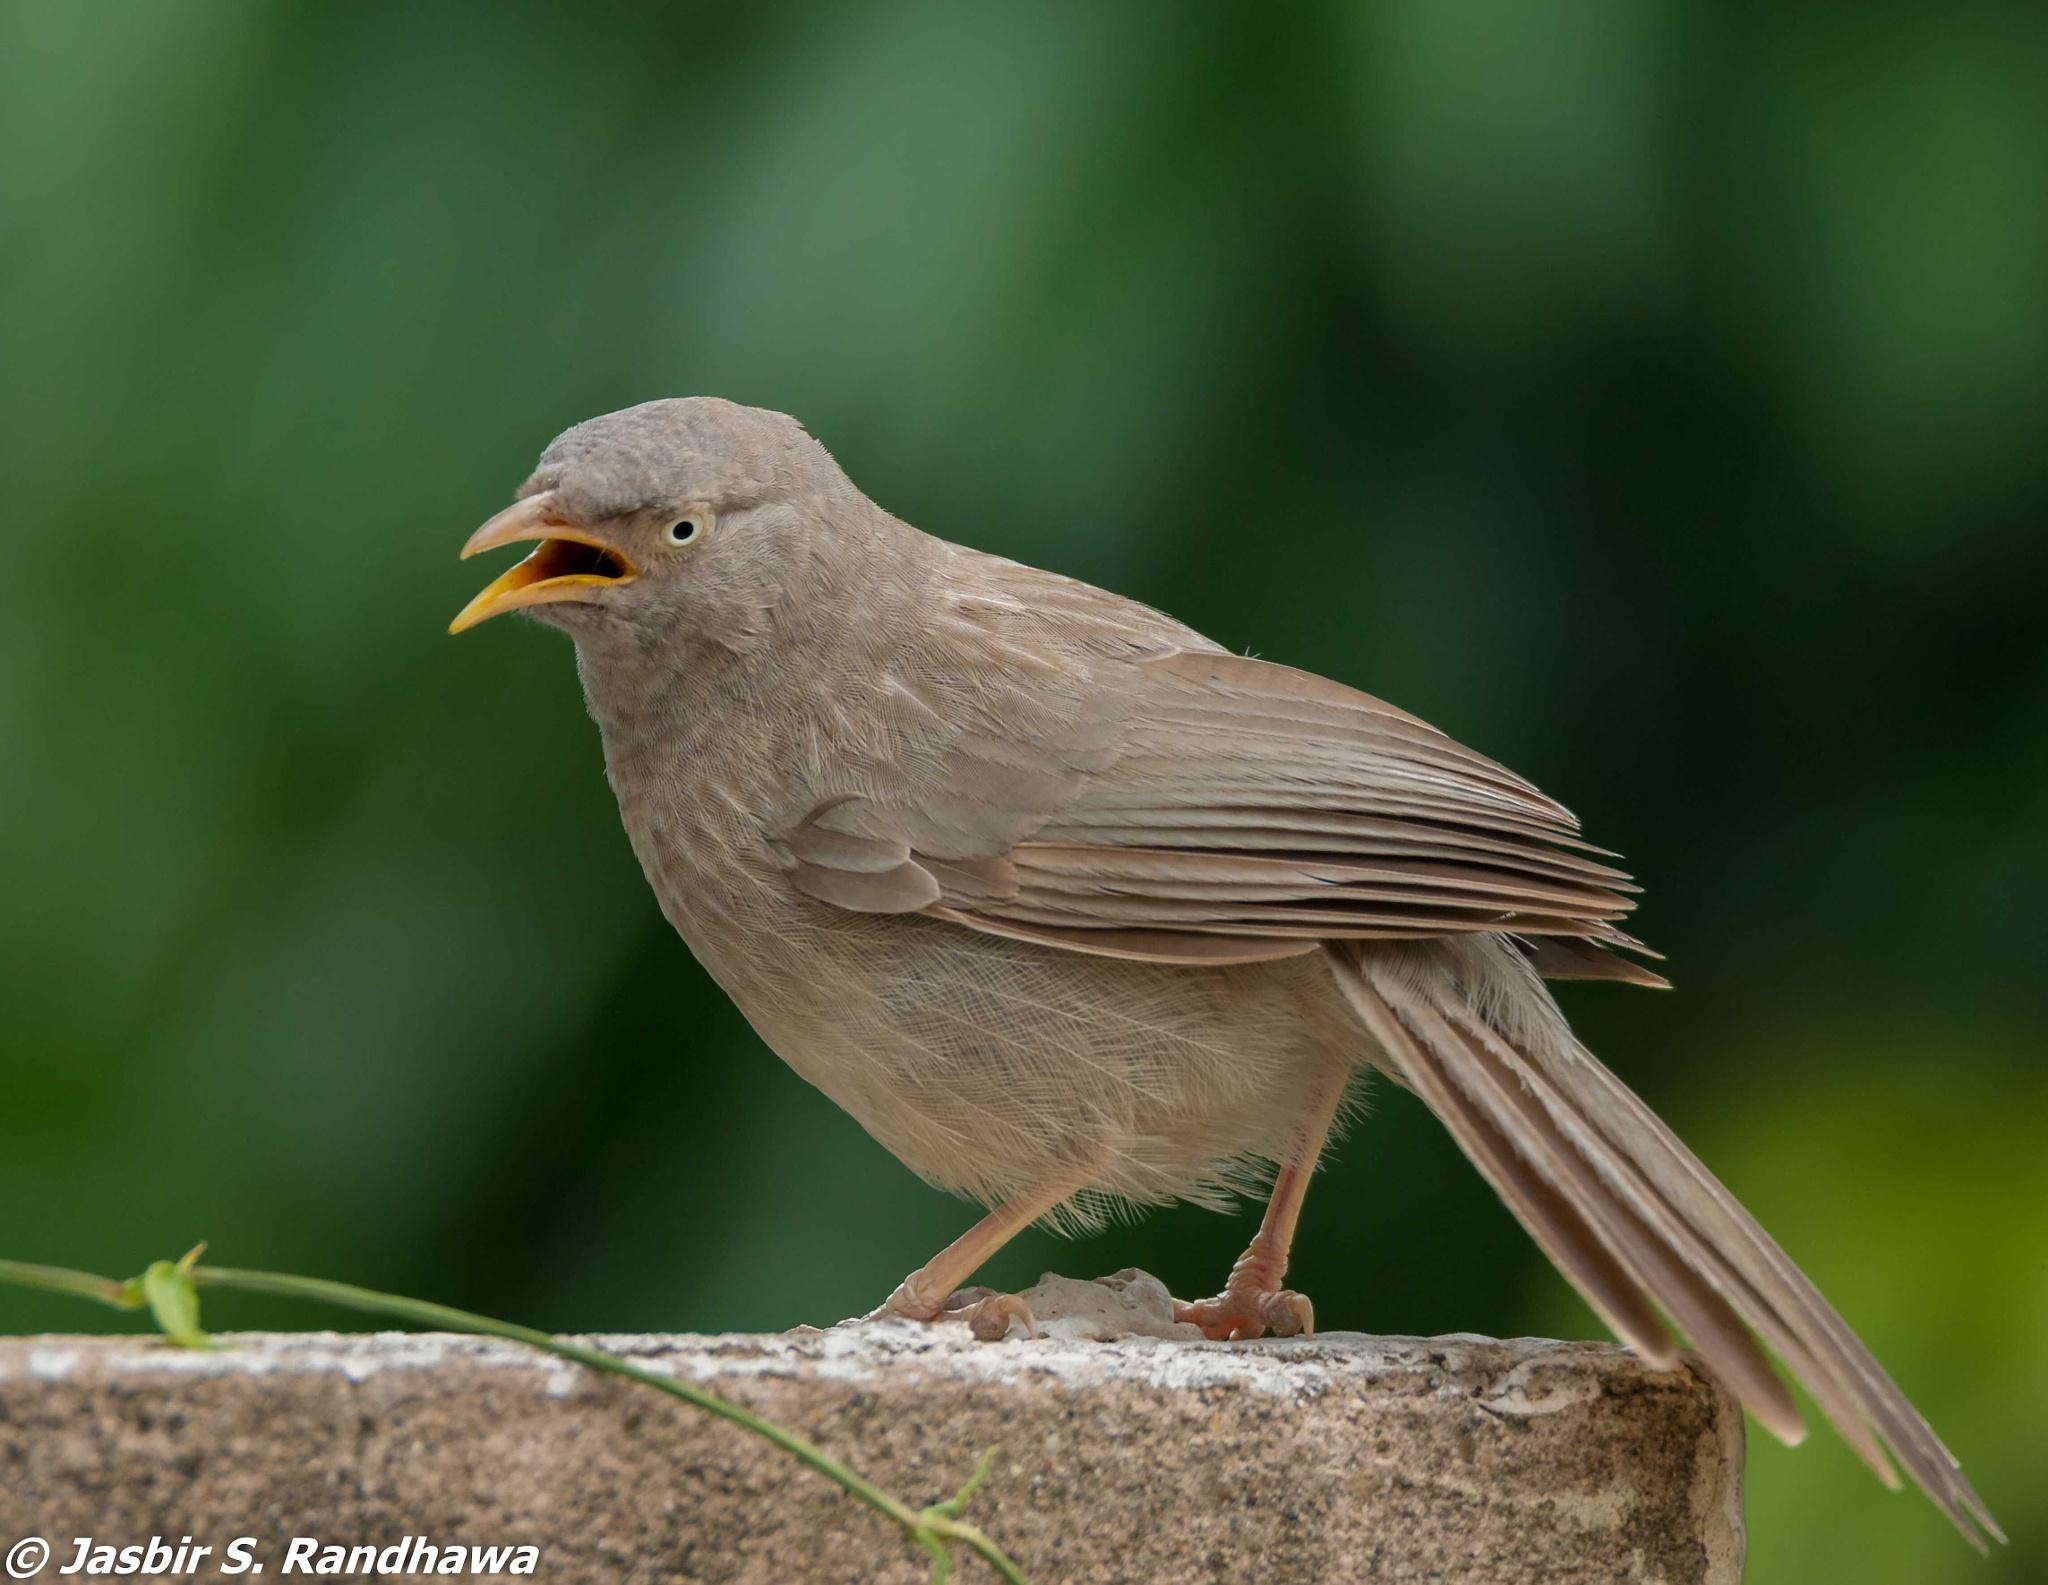 Jungle Babbler (Turdoides striata) by Jasbir S. Randhawa